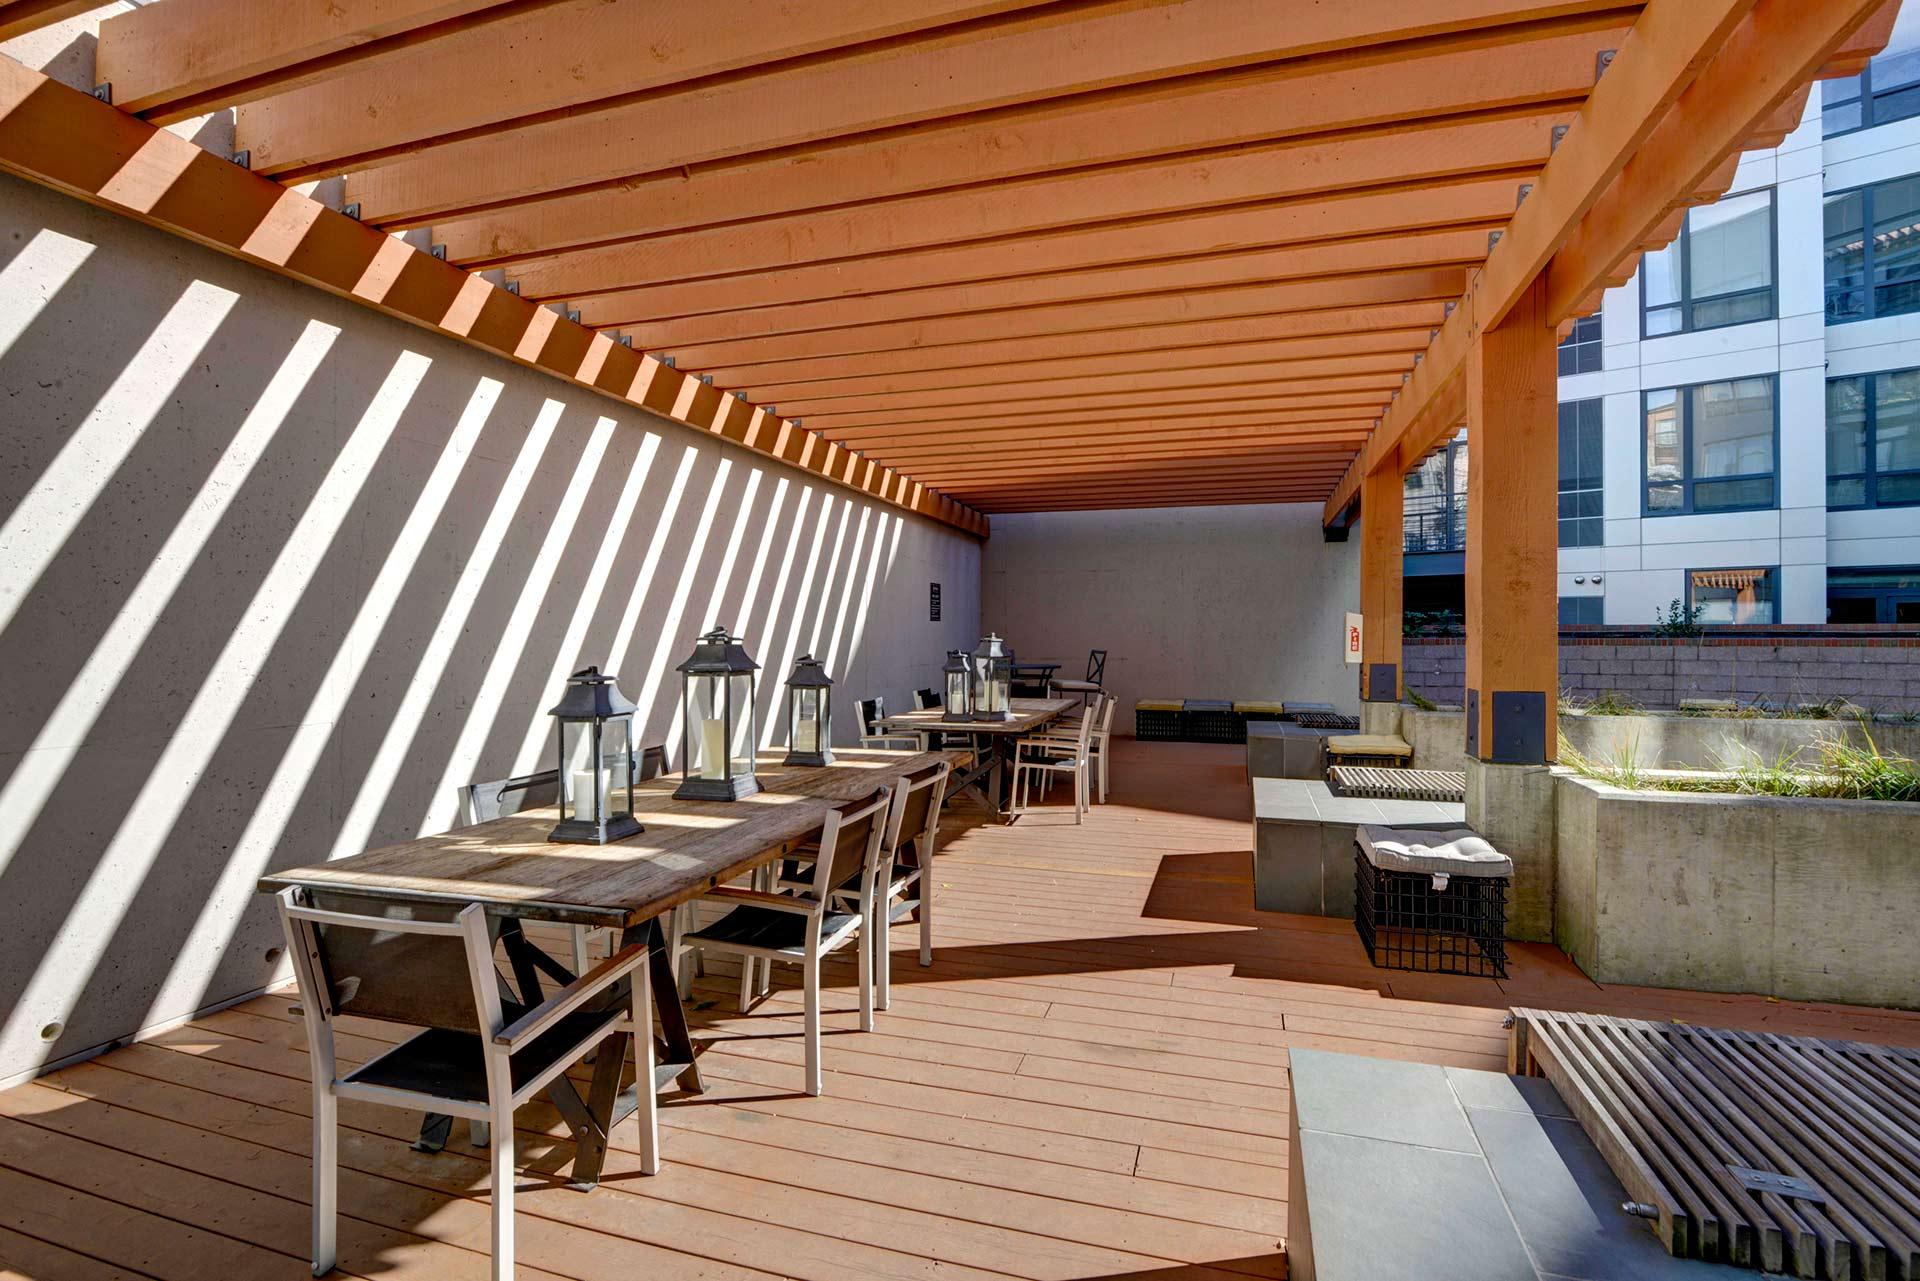 Interior courtyard closeup of café tables under the banded sunlight filtering through a trellis